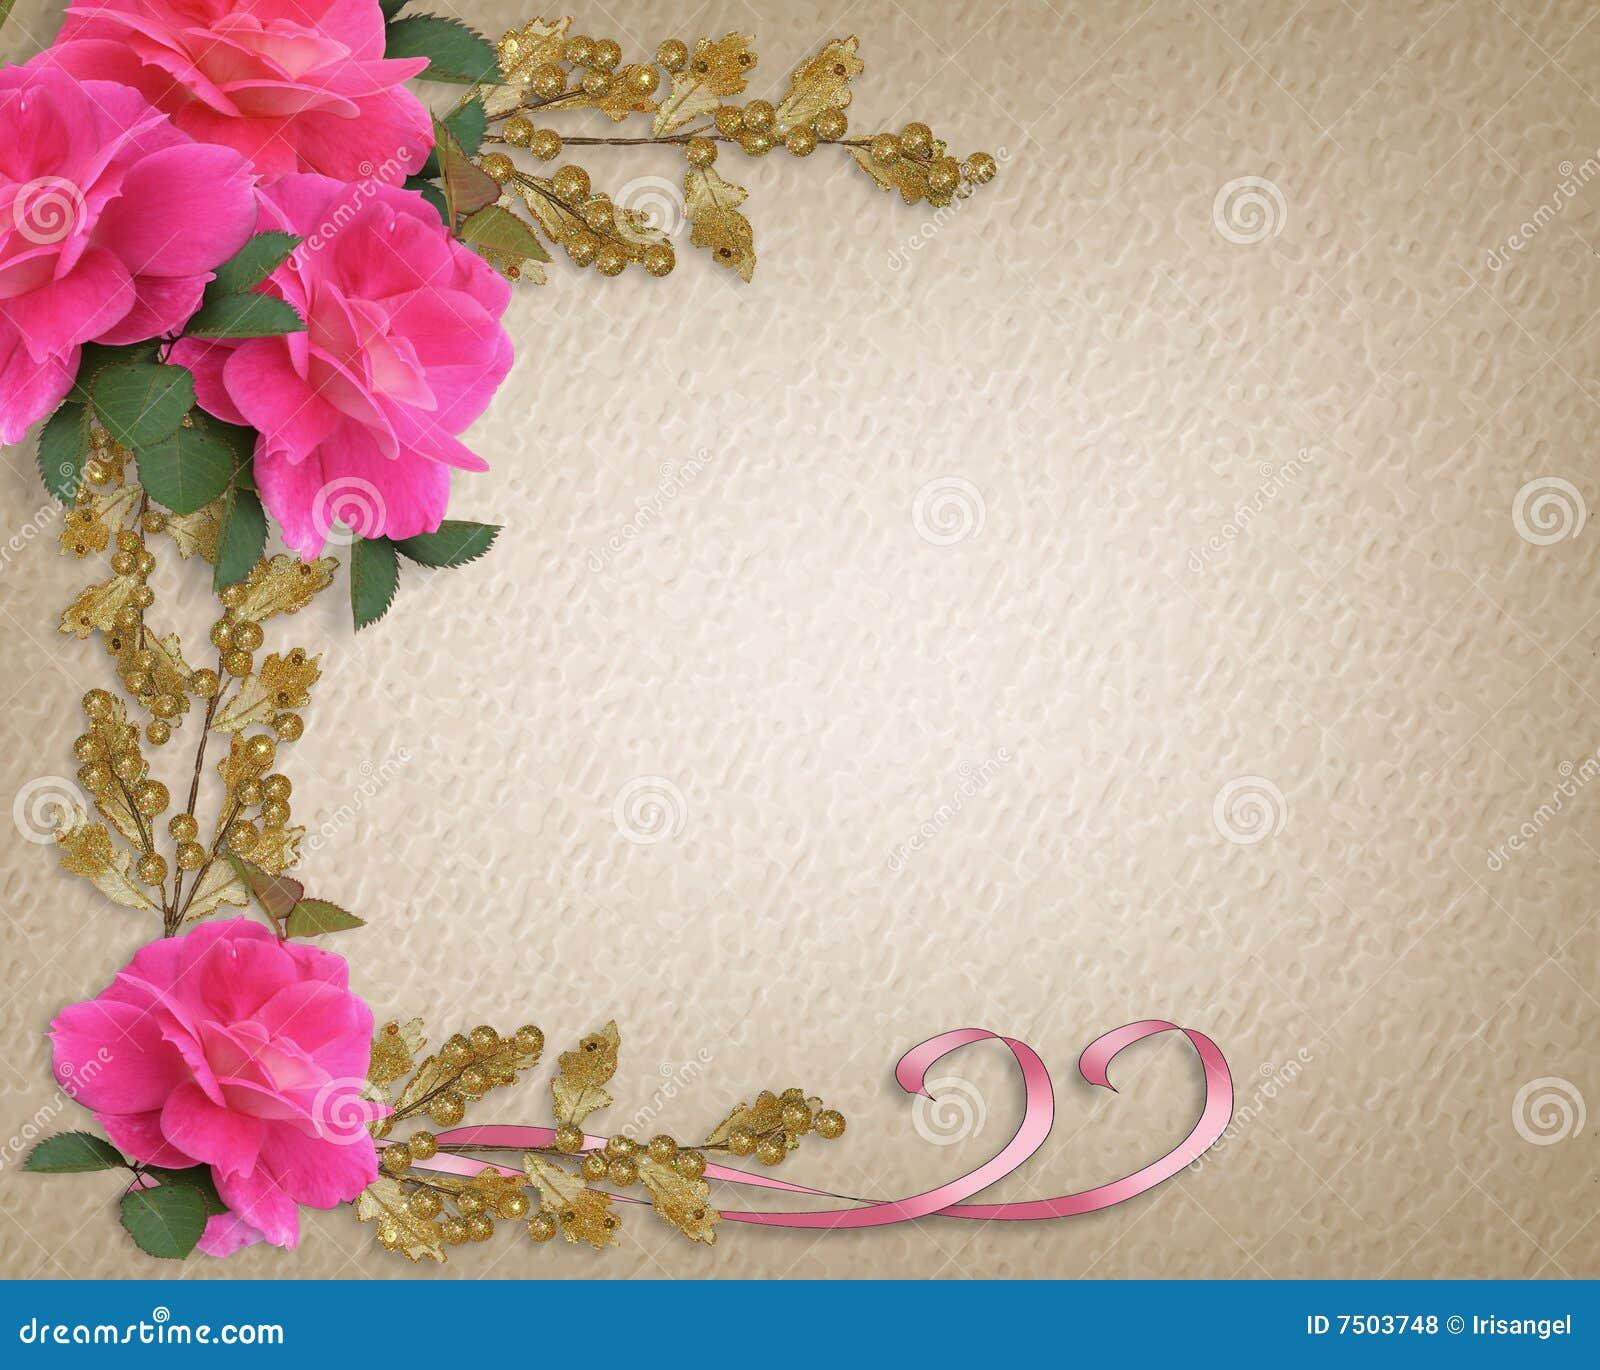 Wedding Invitation Border Pink Roses